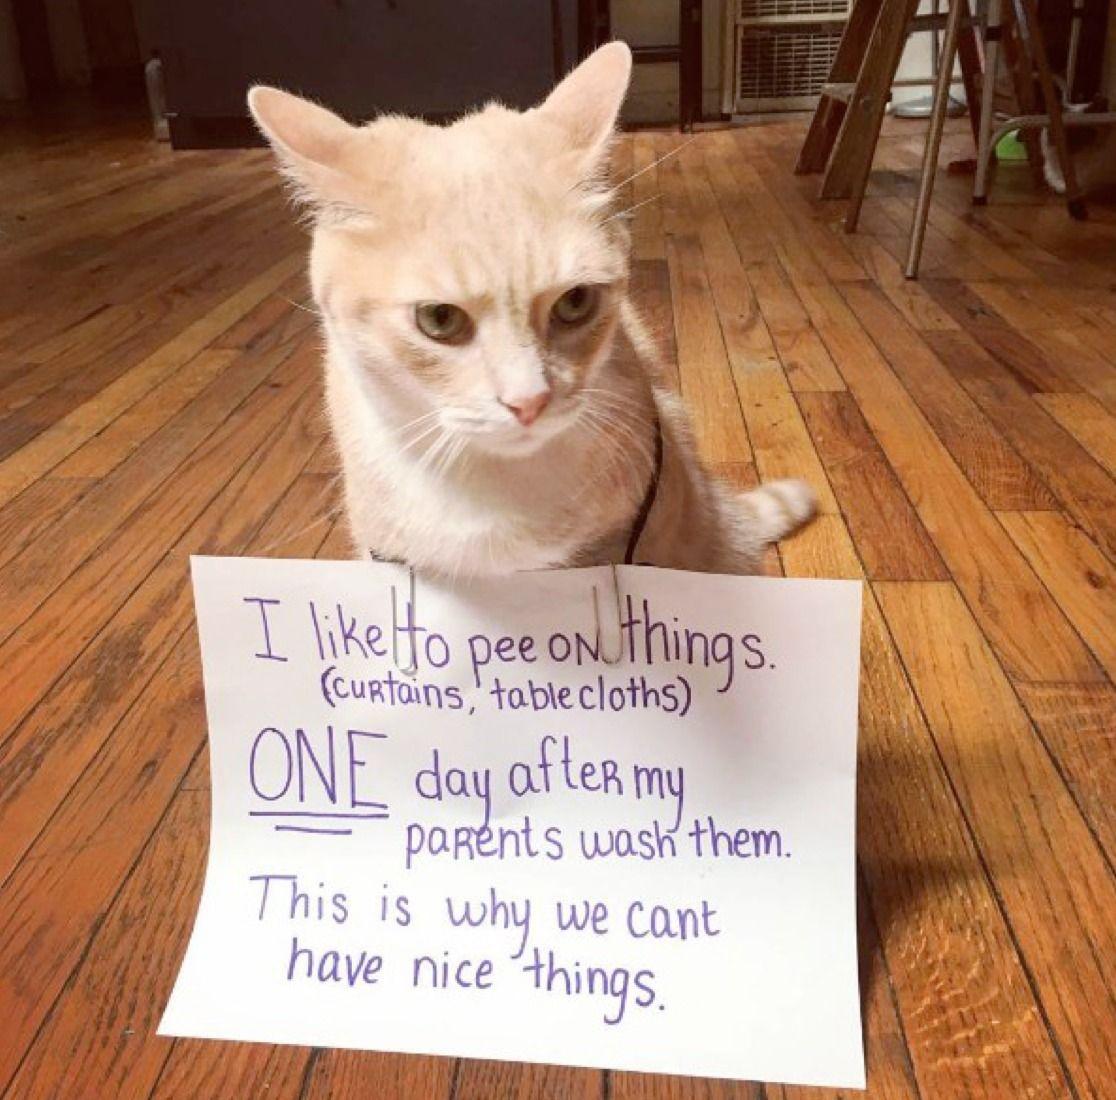 Pin by LifeBuzz on Pets Cute cat memes, Cat shaming